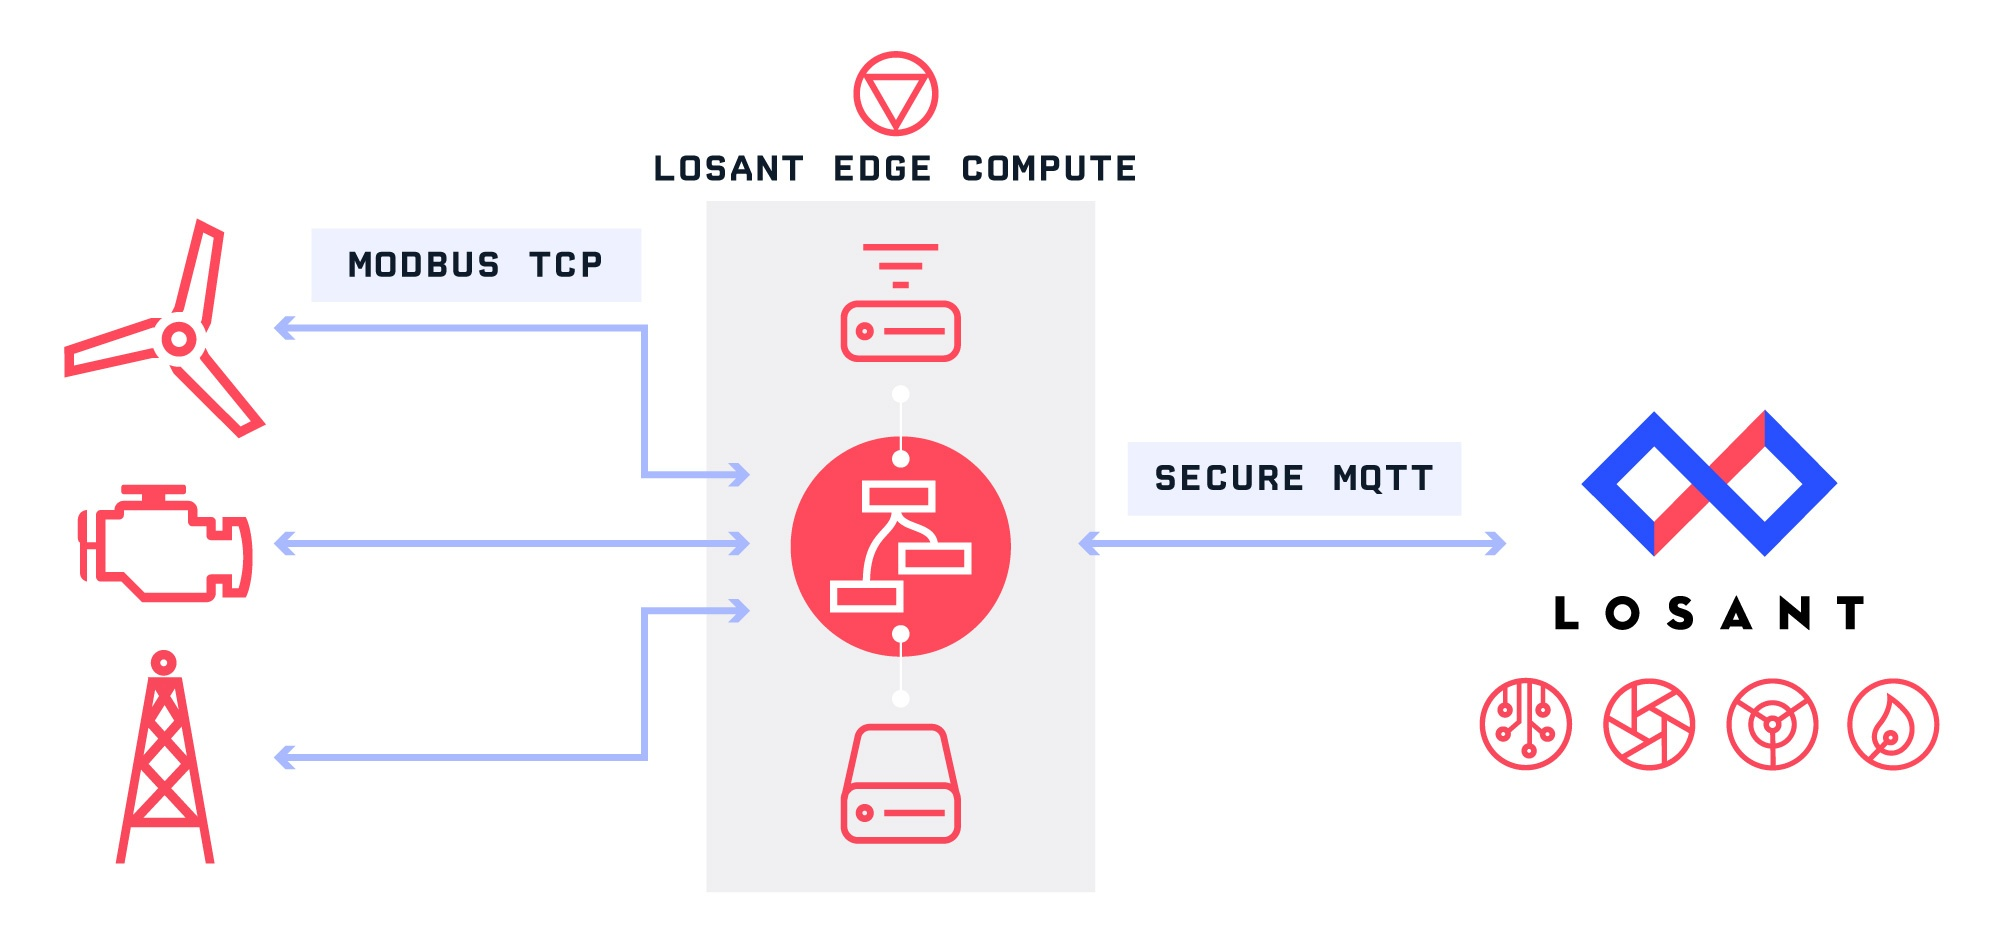 How Losant Edge Compute Works Diagram